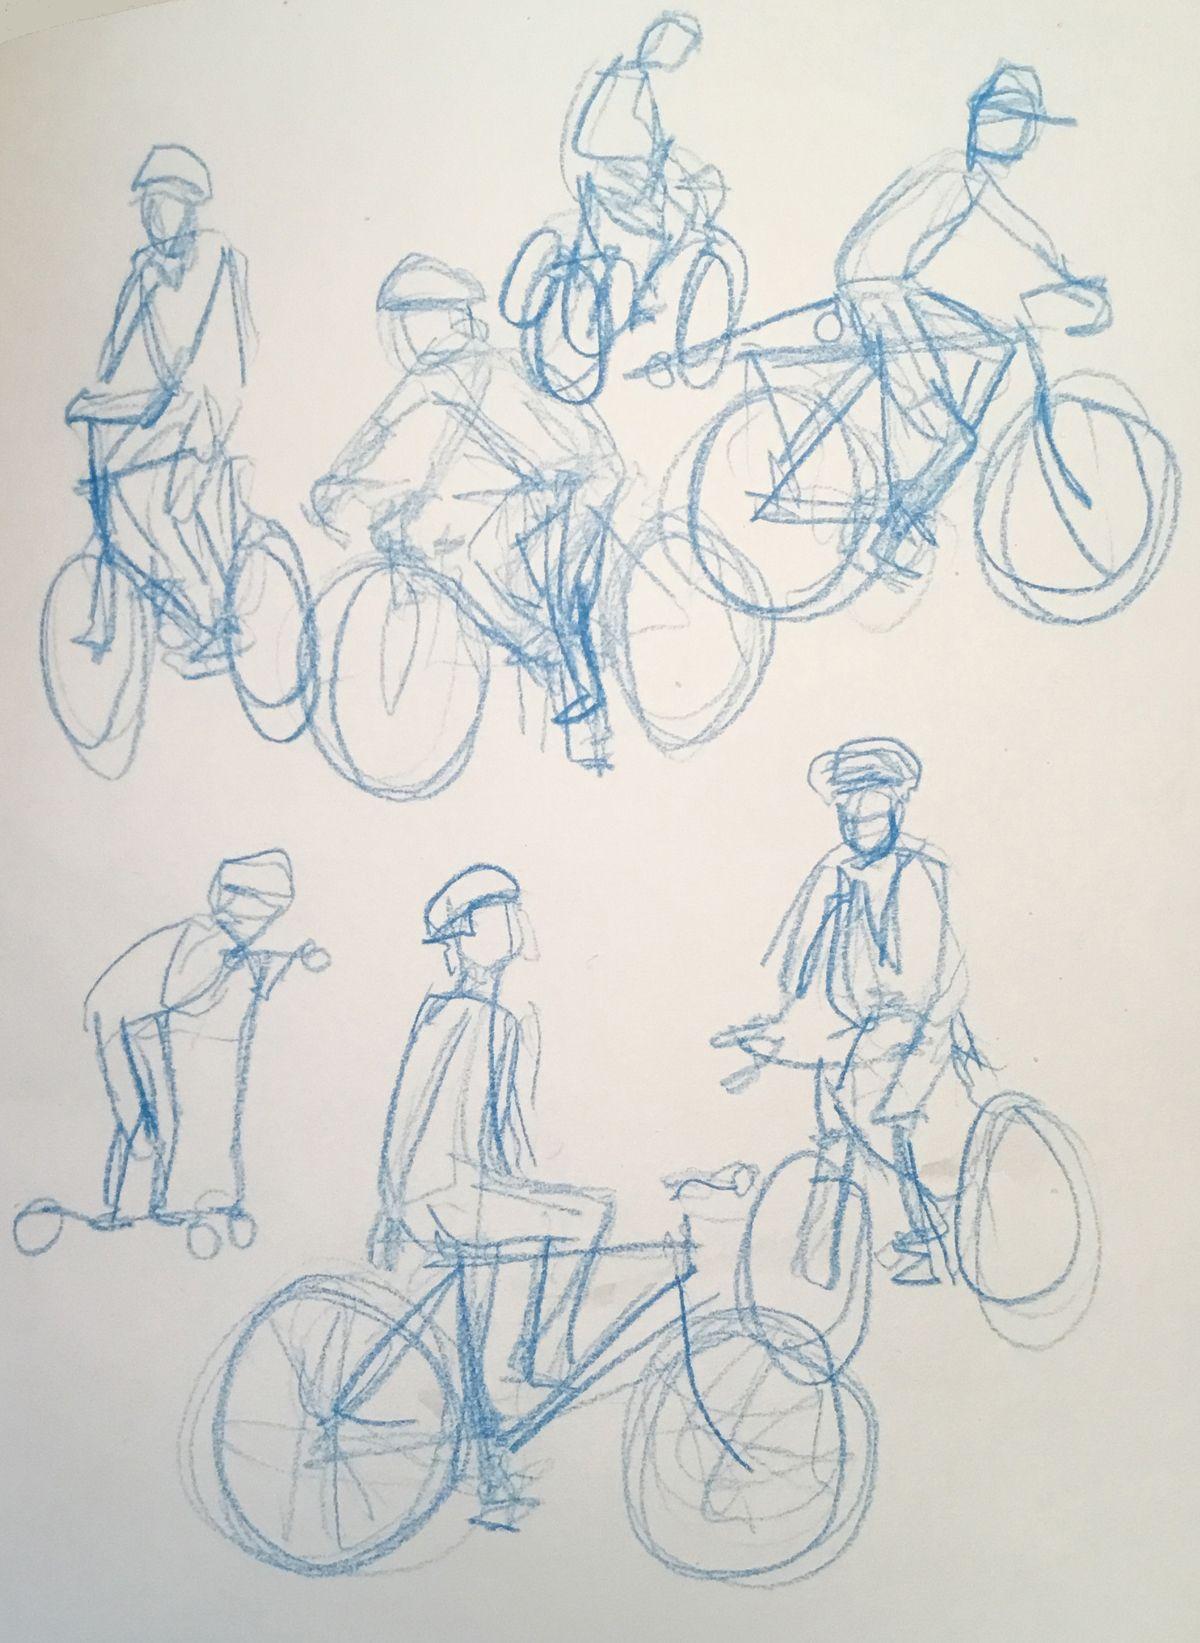 Artist: Anthony Ryan, Title: Golden Gate Park Rollers, Medium: pencil (sketchbook page)